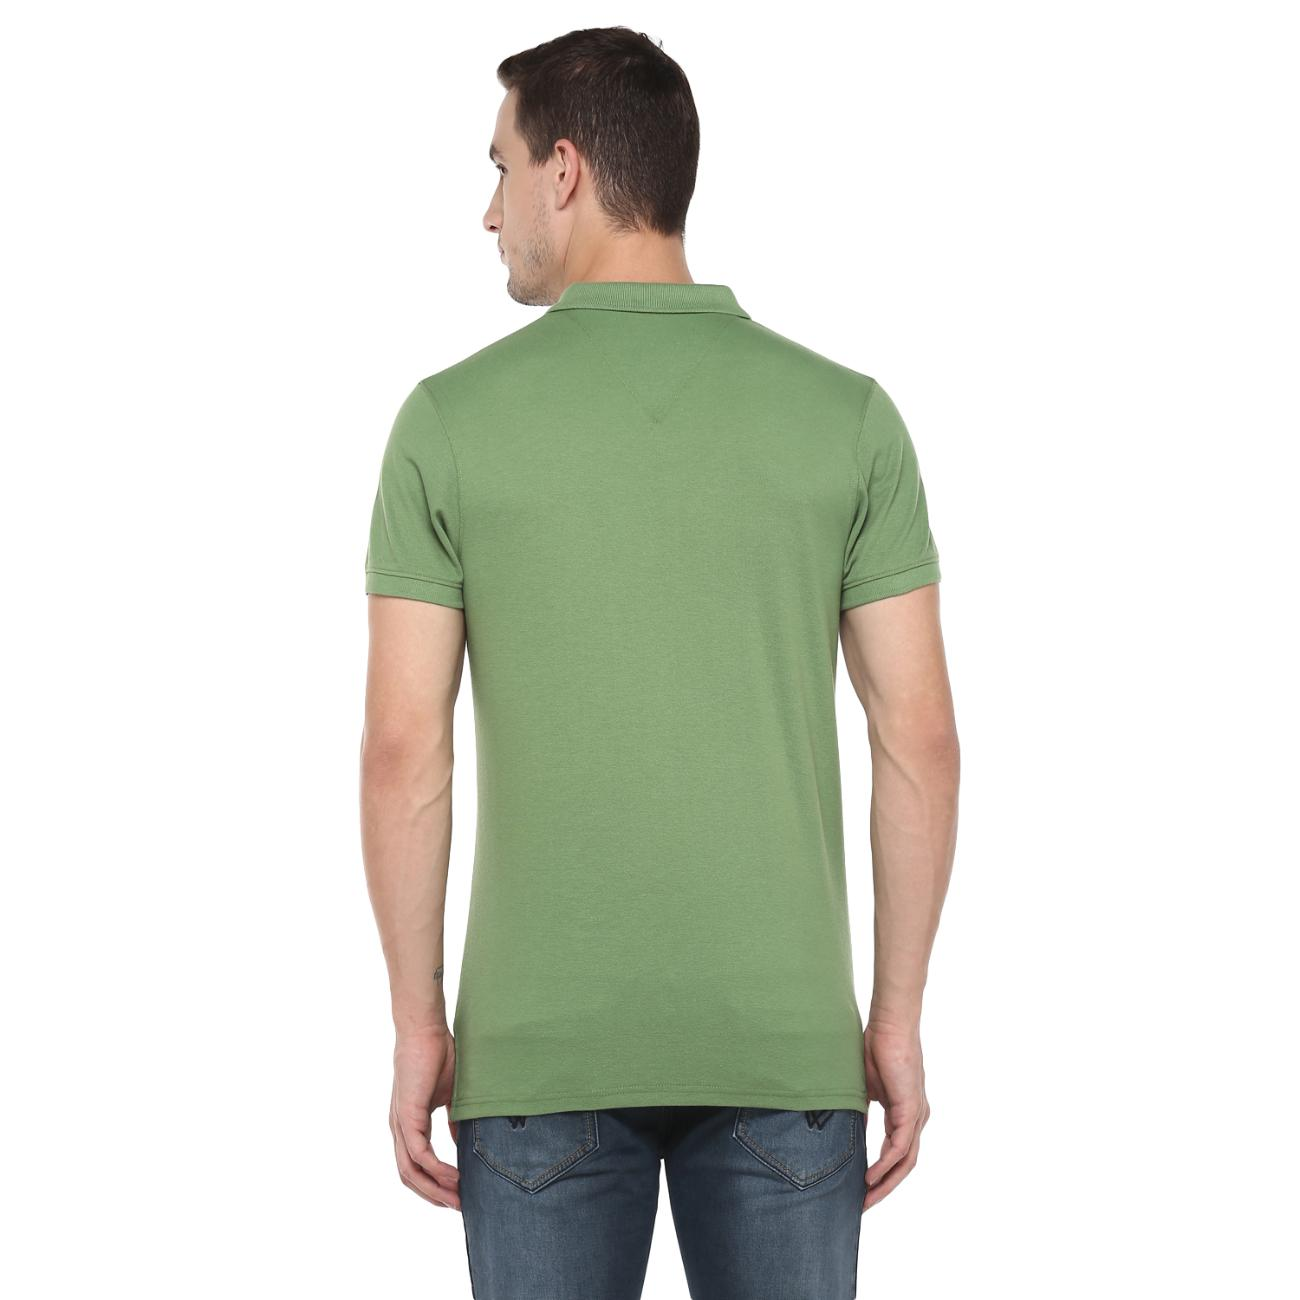 Collar Neck TShirts